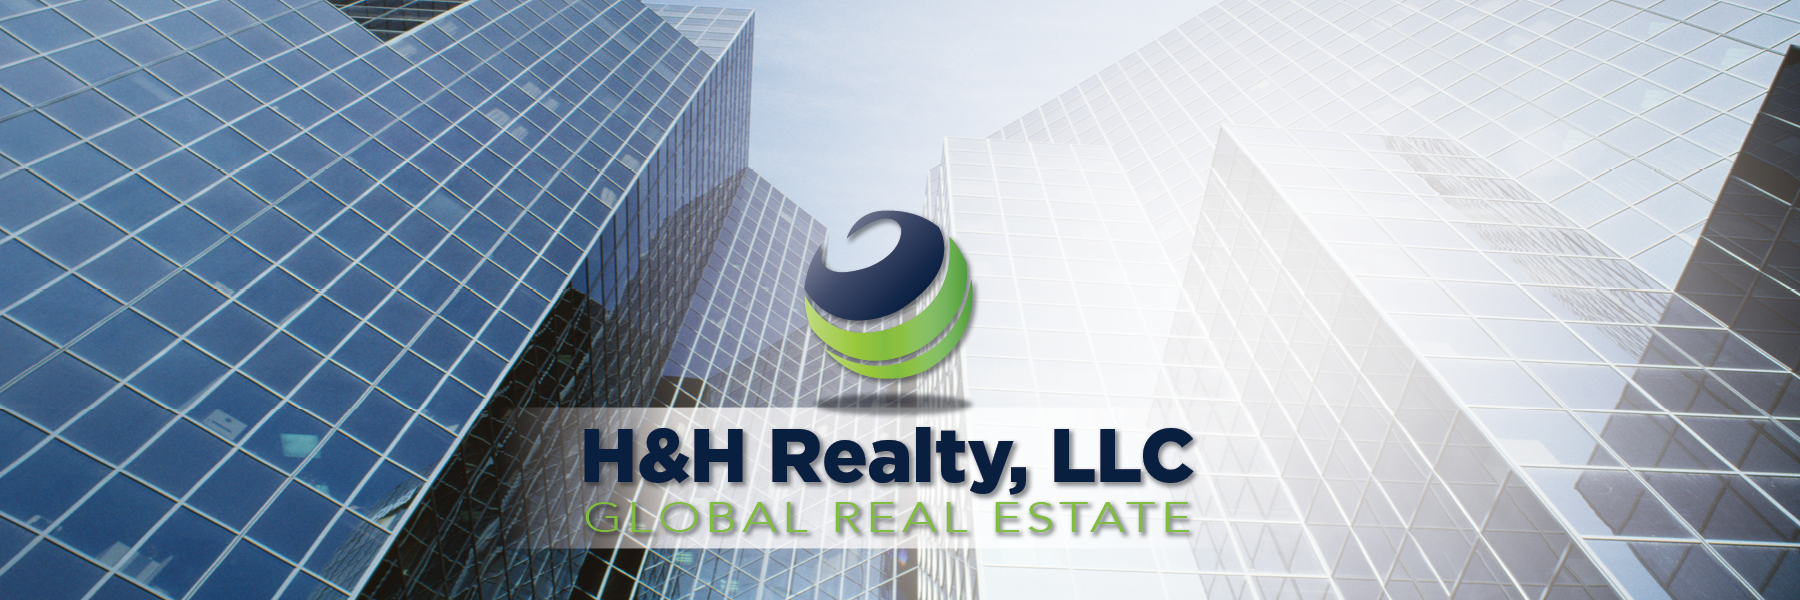 H & H Realty, Inc.